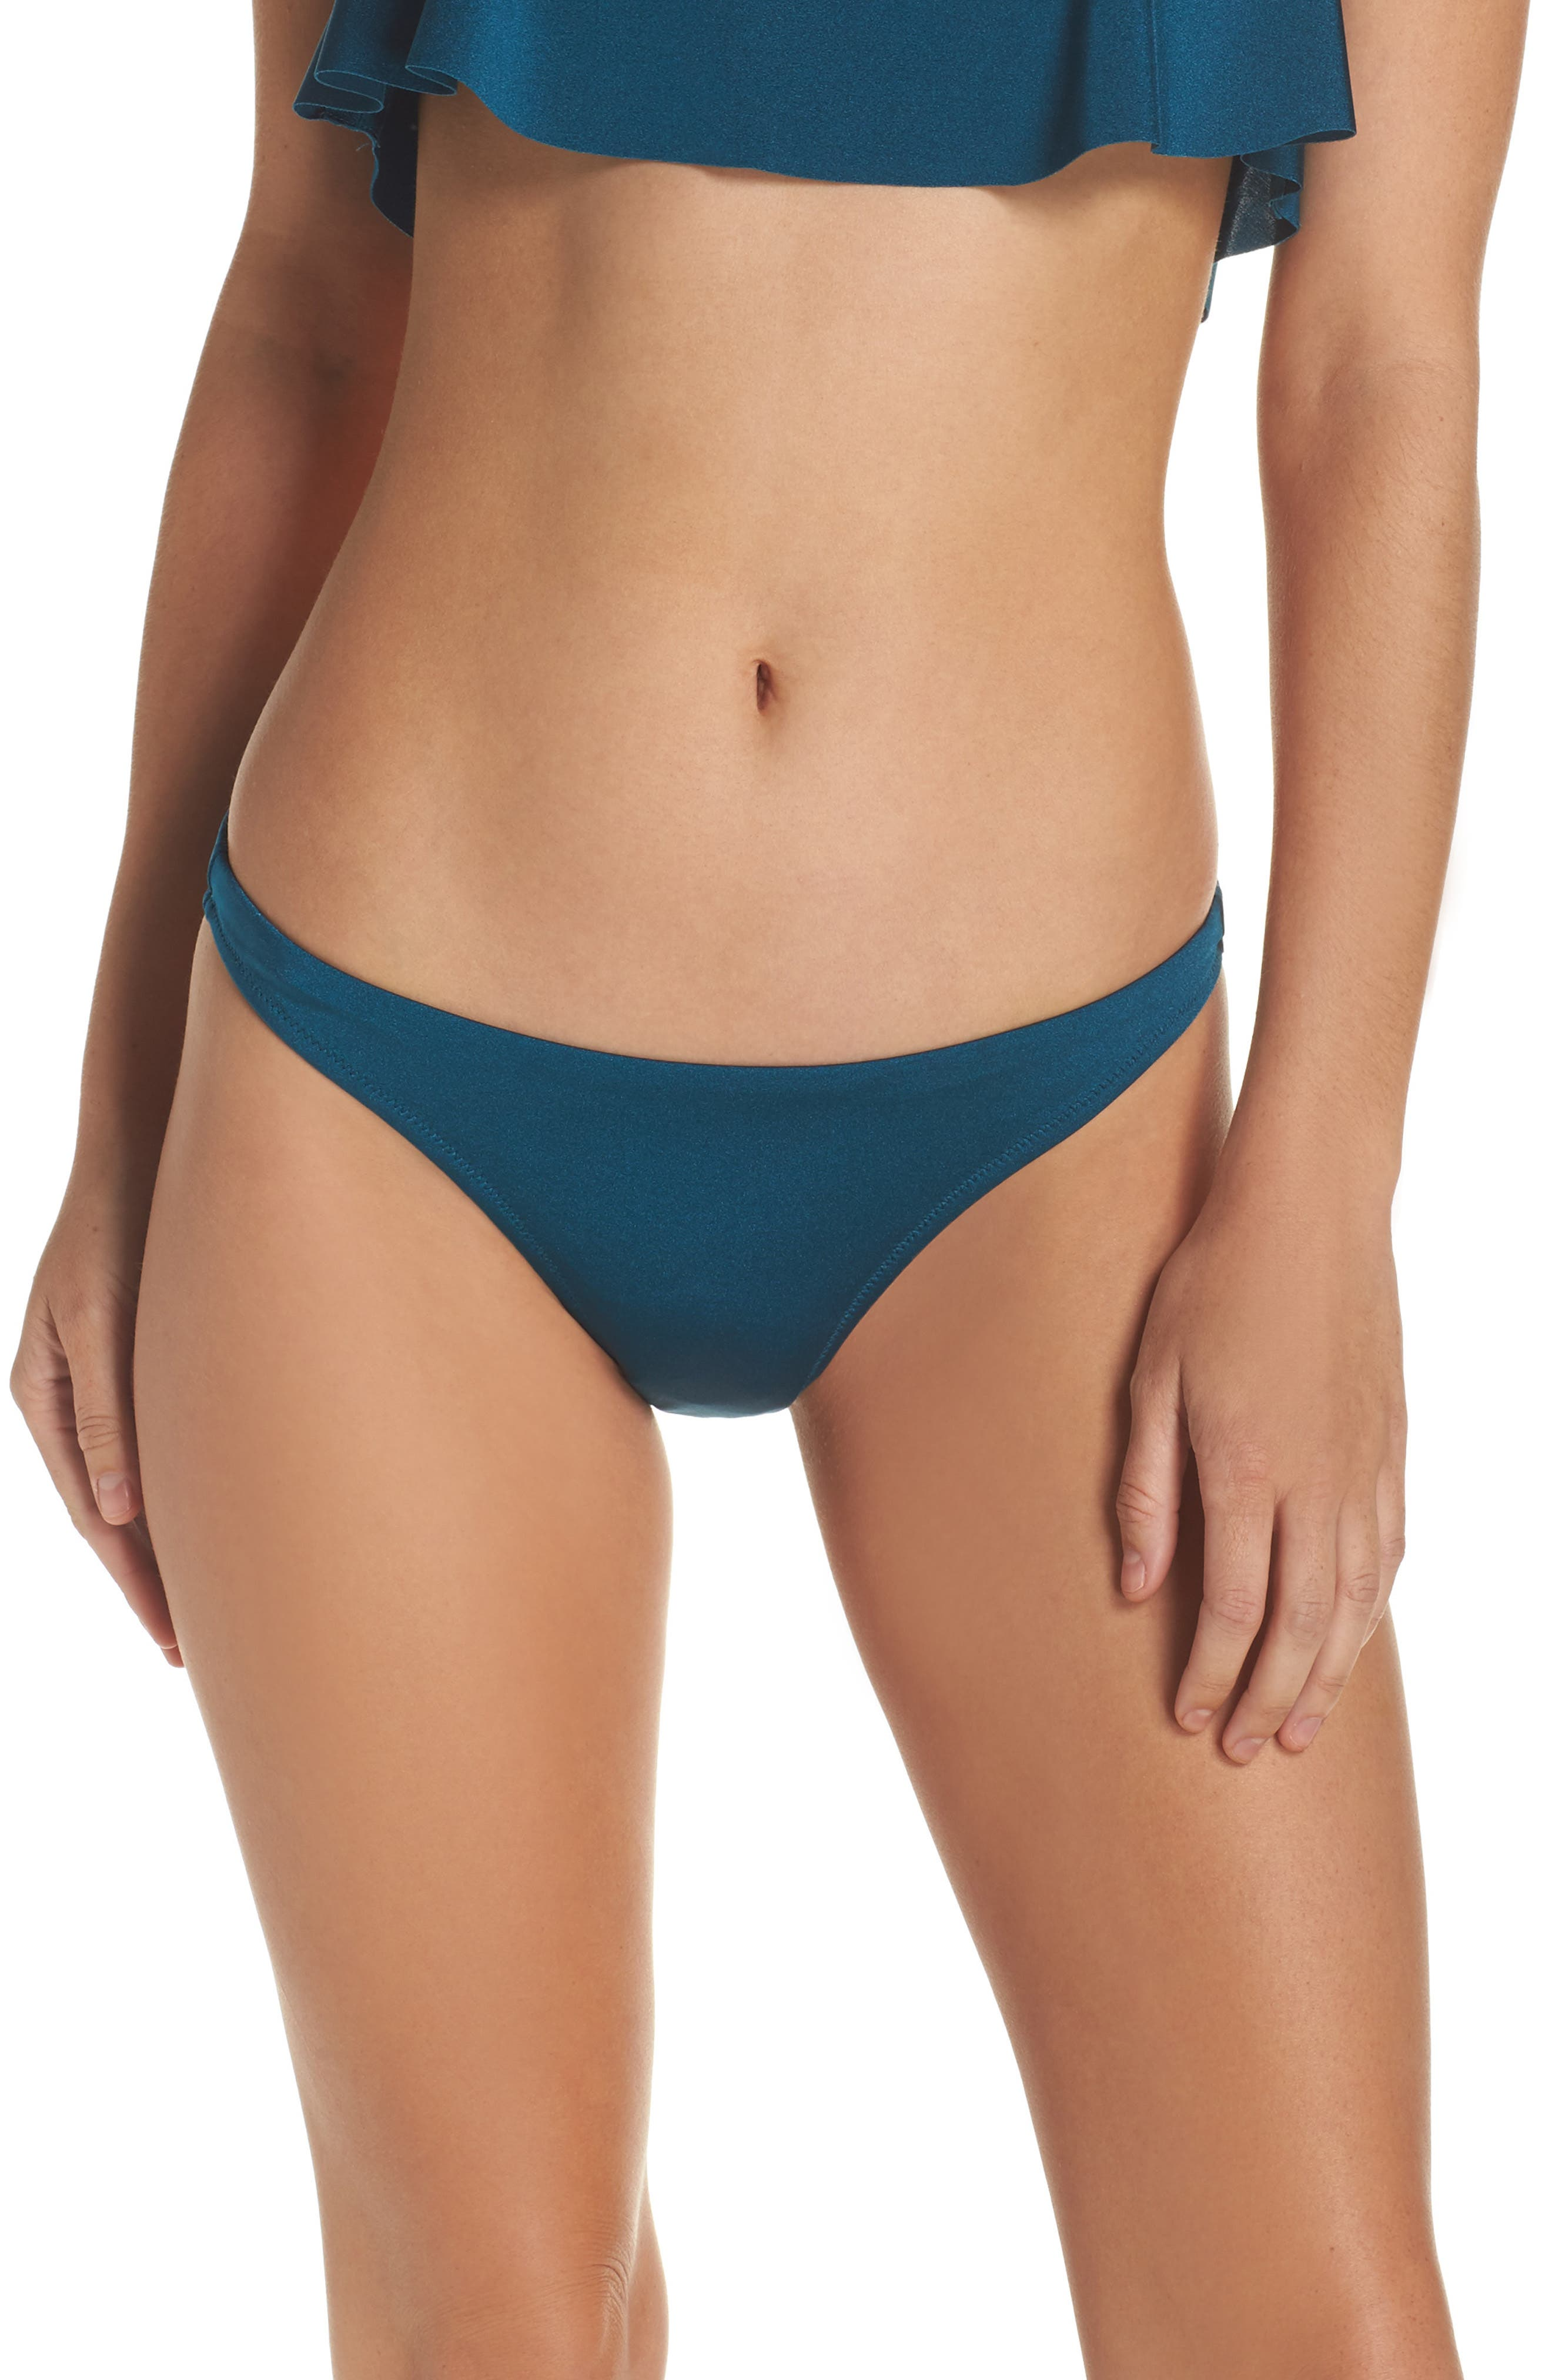 St. Lucia Bikini Bottoms,                             Main thumbnail 1, color,                             445